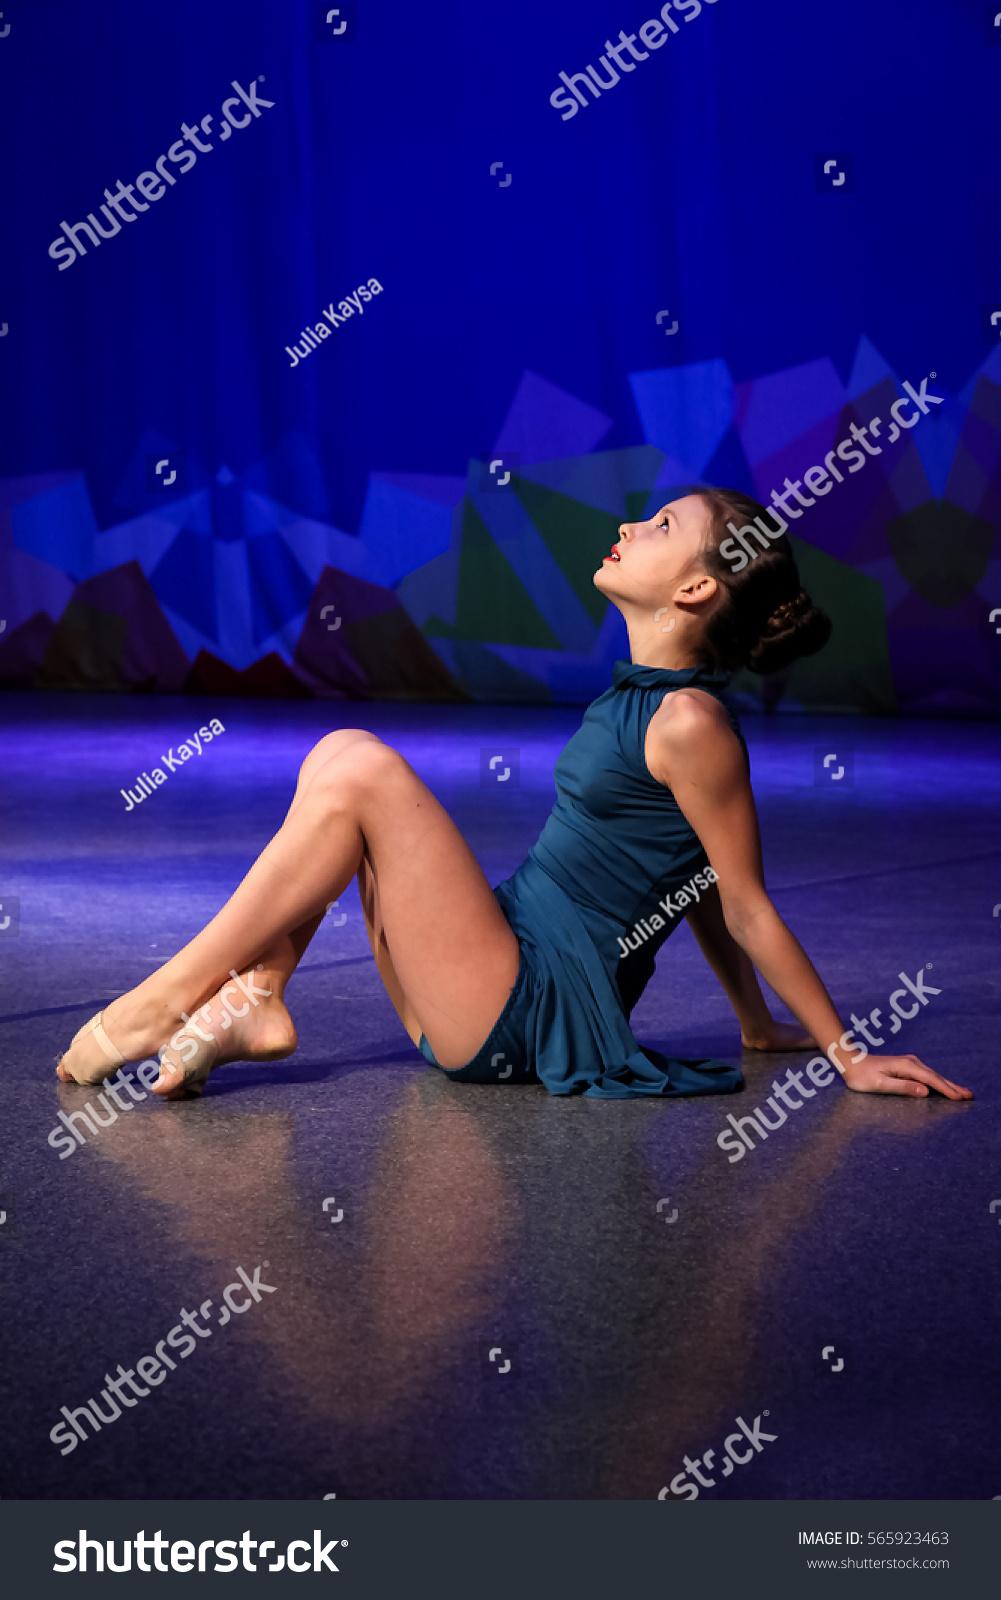 Girl dancing modern dance dancer dreamily stock photo for Dance where you sit on the floor